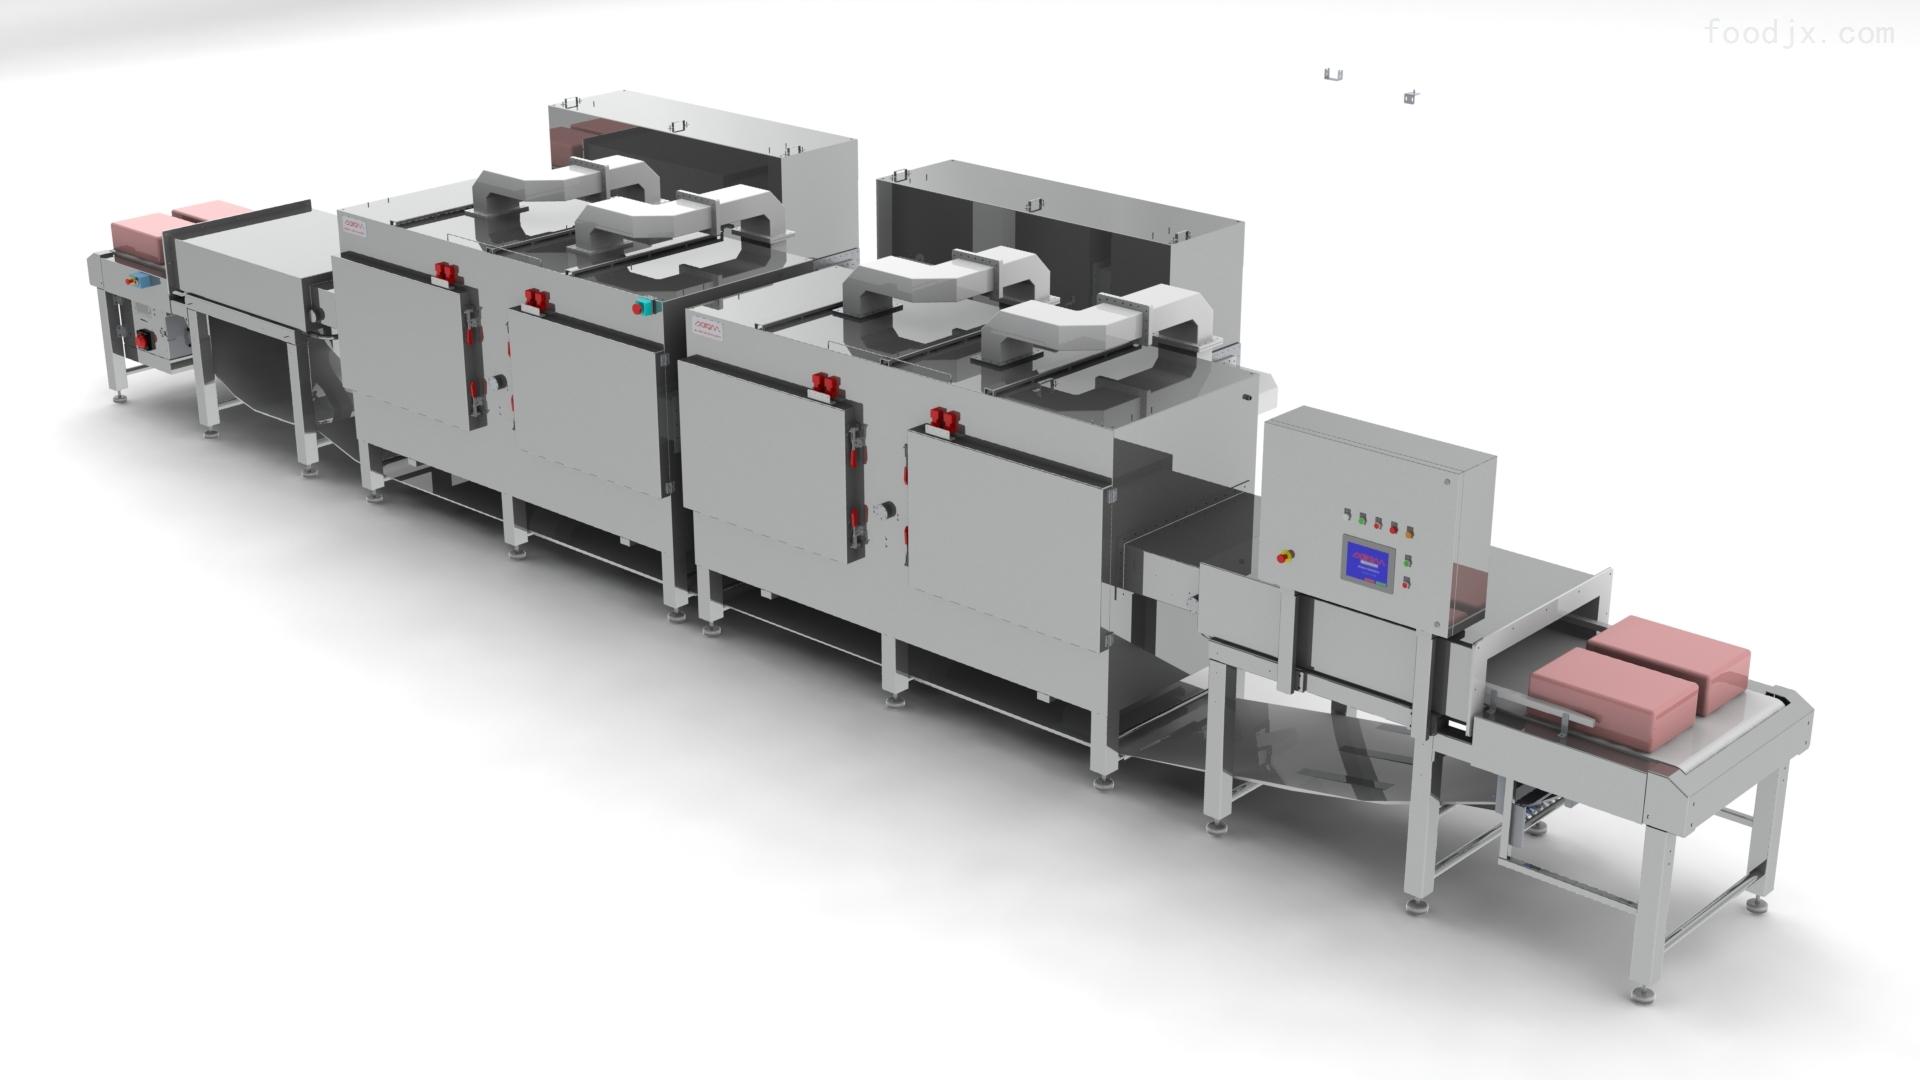 RF 射频解冻机 肉制品缓化解冻设备 解冻